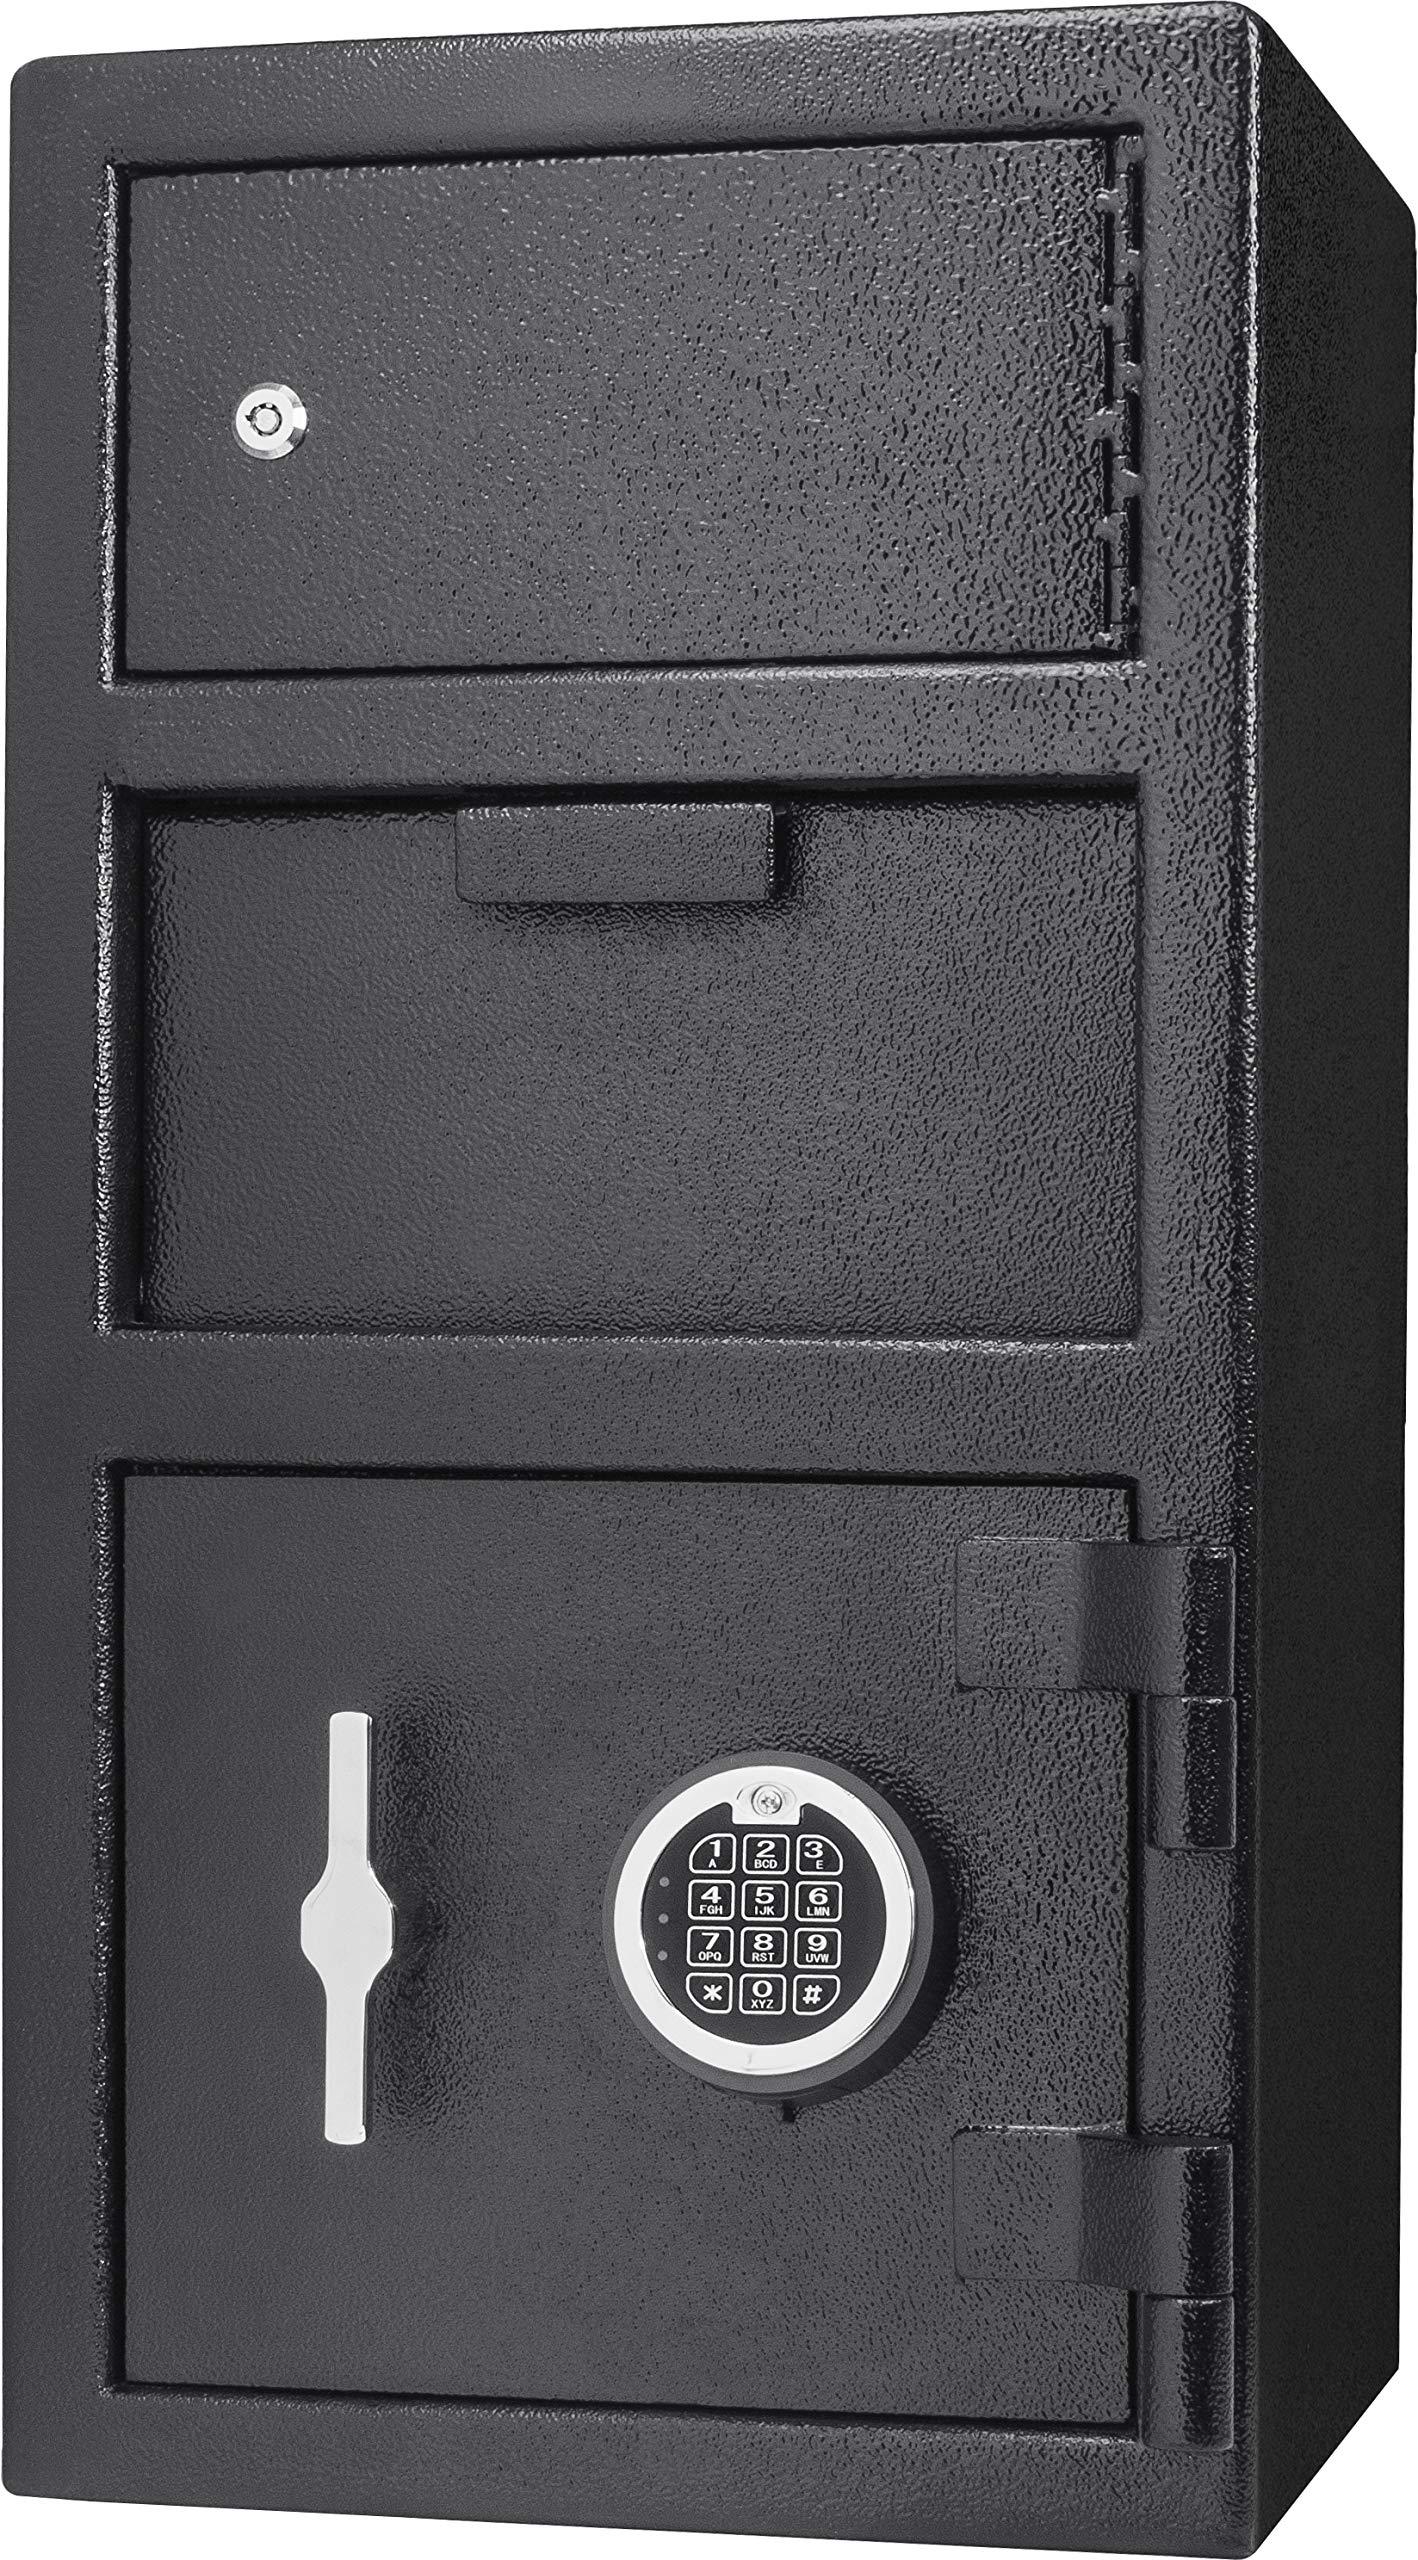 Winbest Steel Digital Keypad Security Lock Depository Drop Slot Parcel Mail Safe with Locker